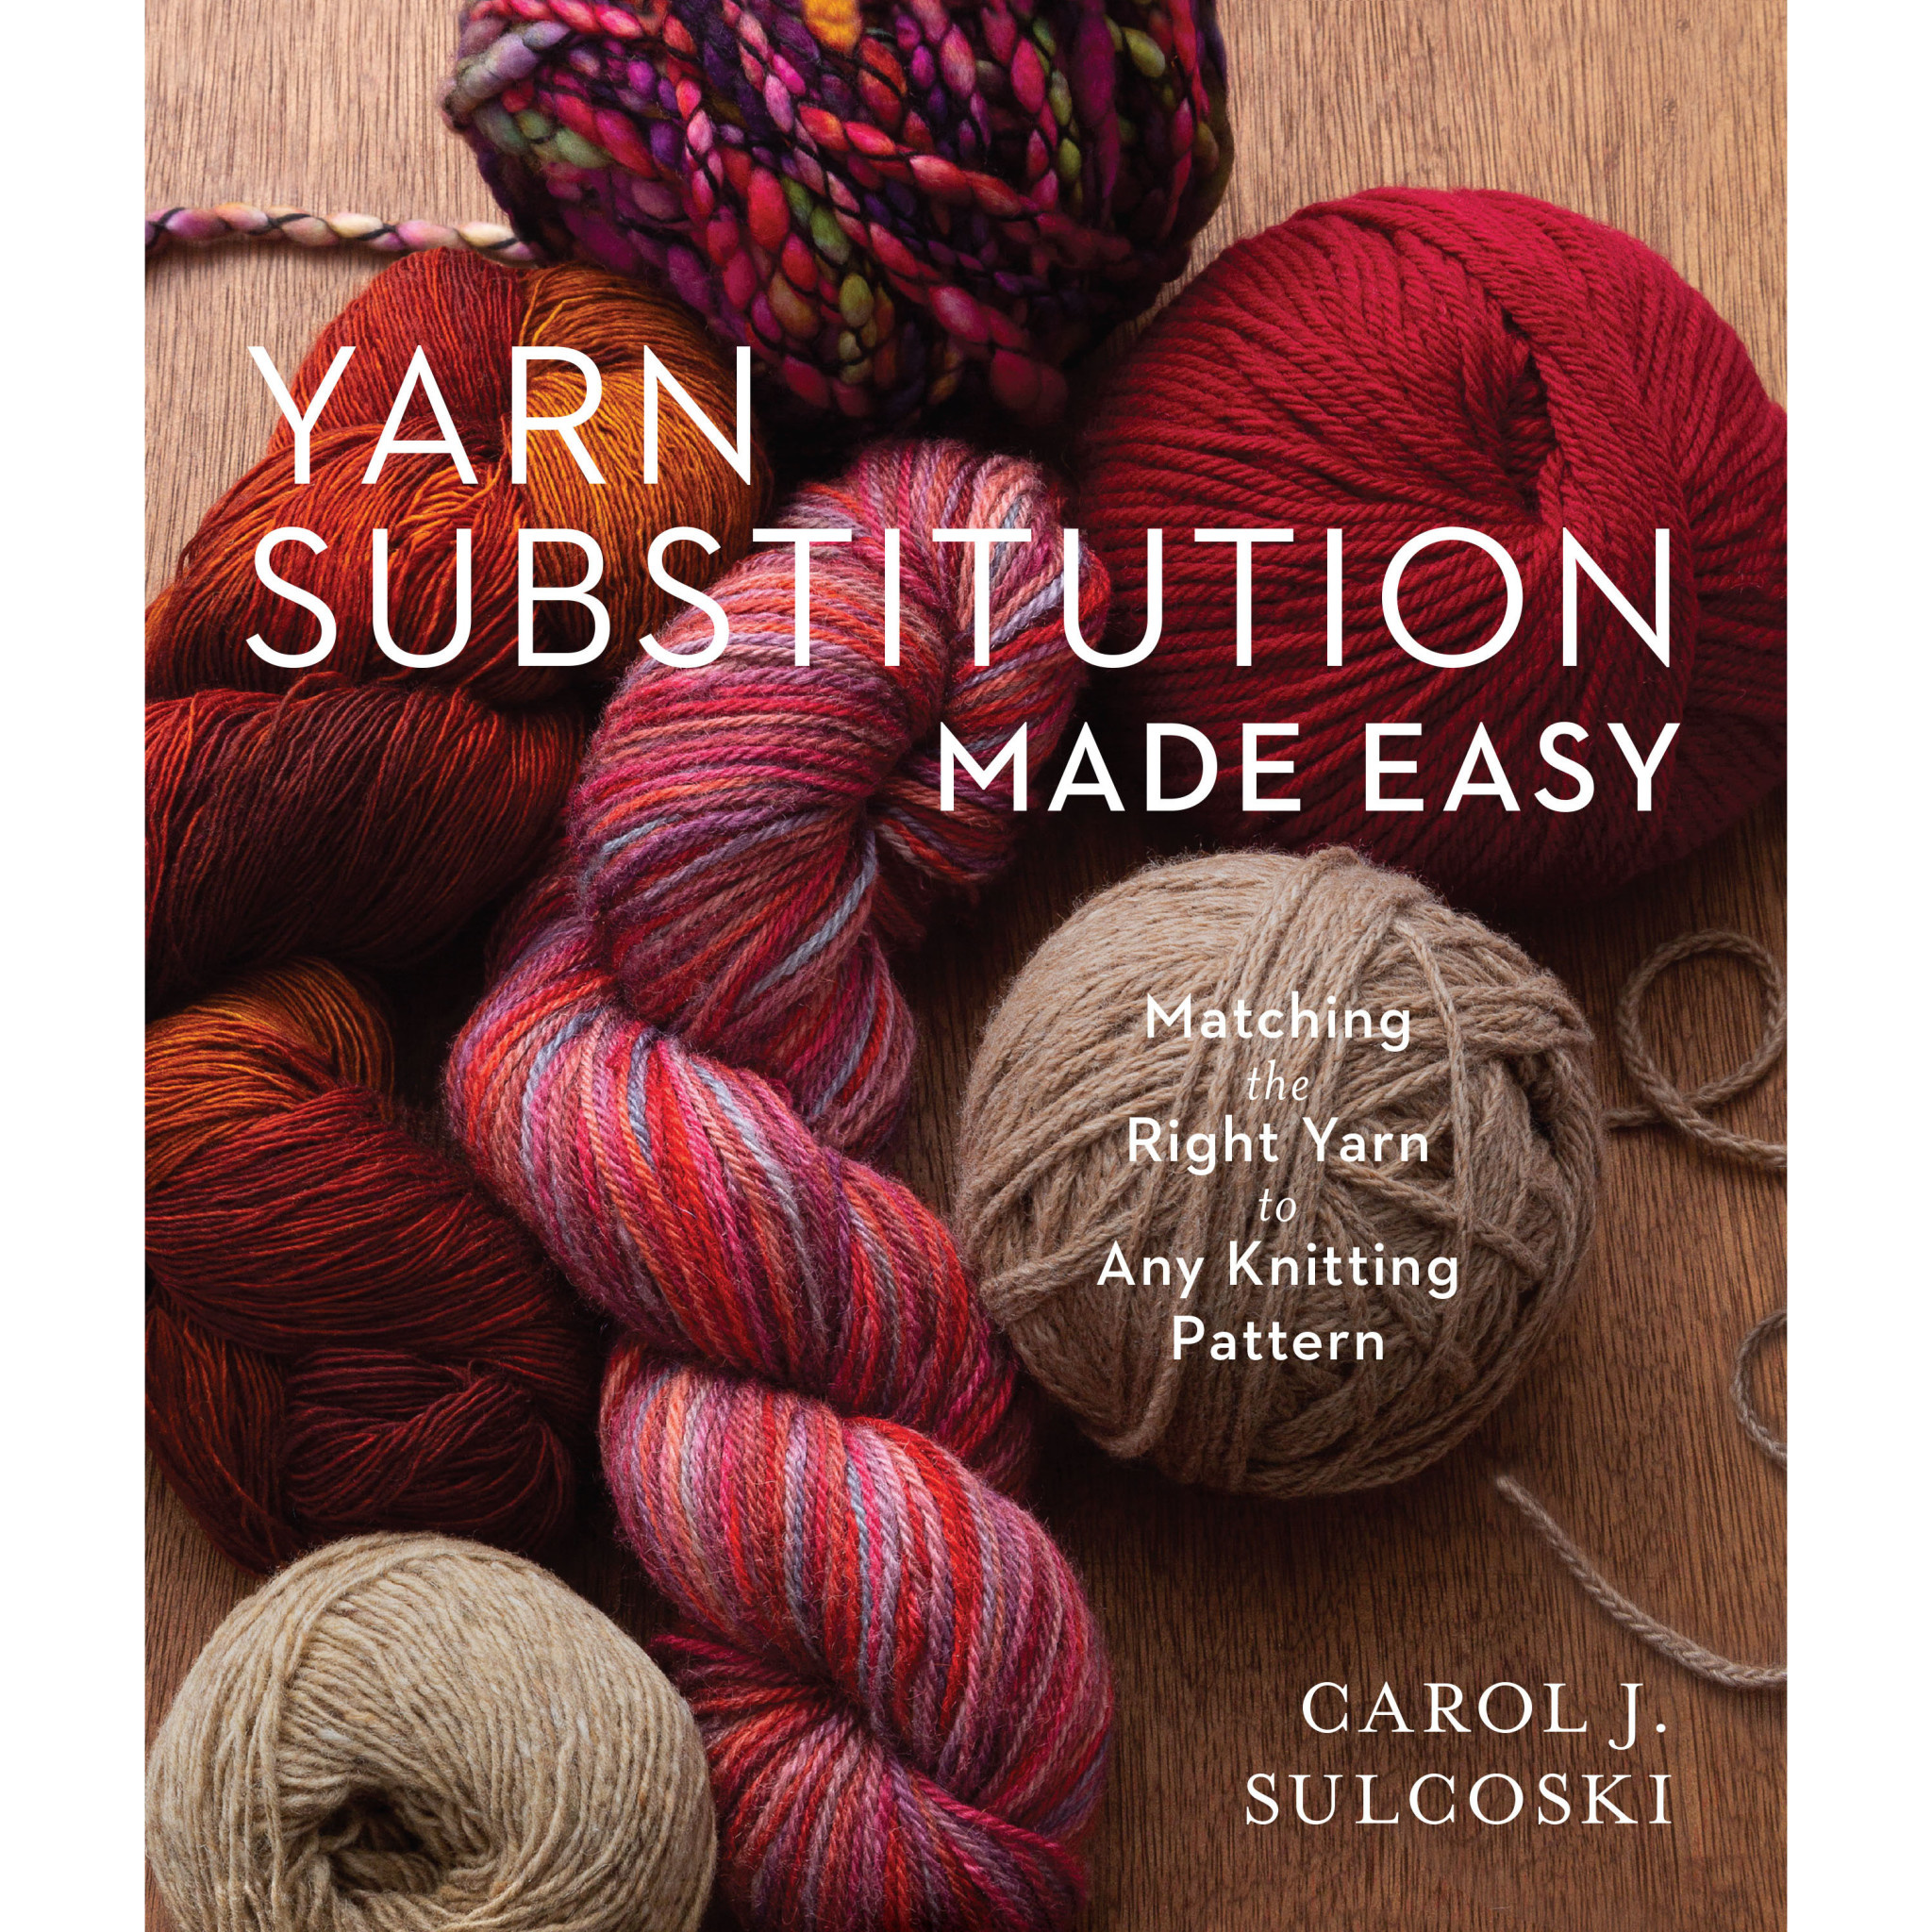 YARN SUBSTITUTION MADE EASY by CAROL J. SULCOSKI